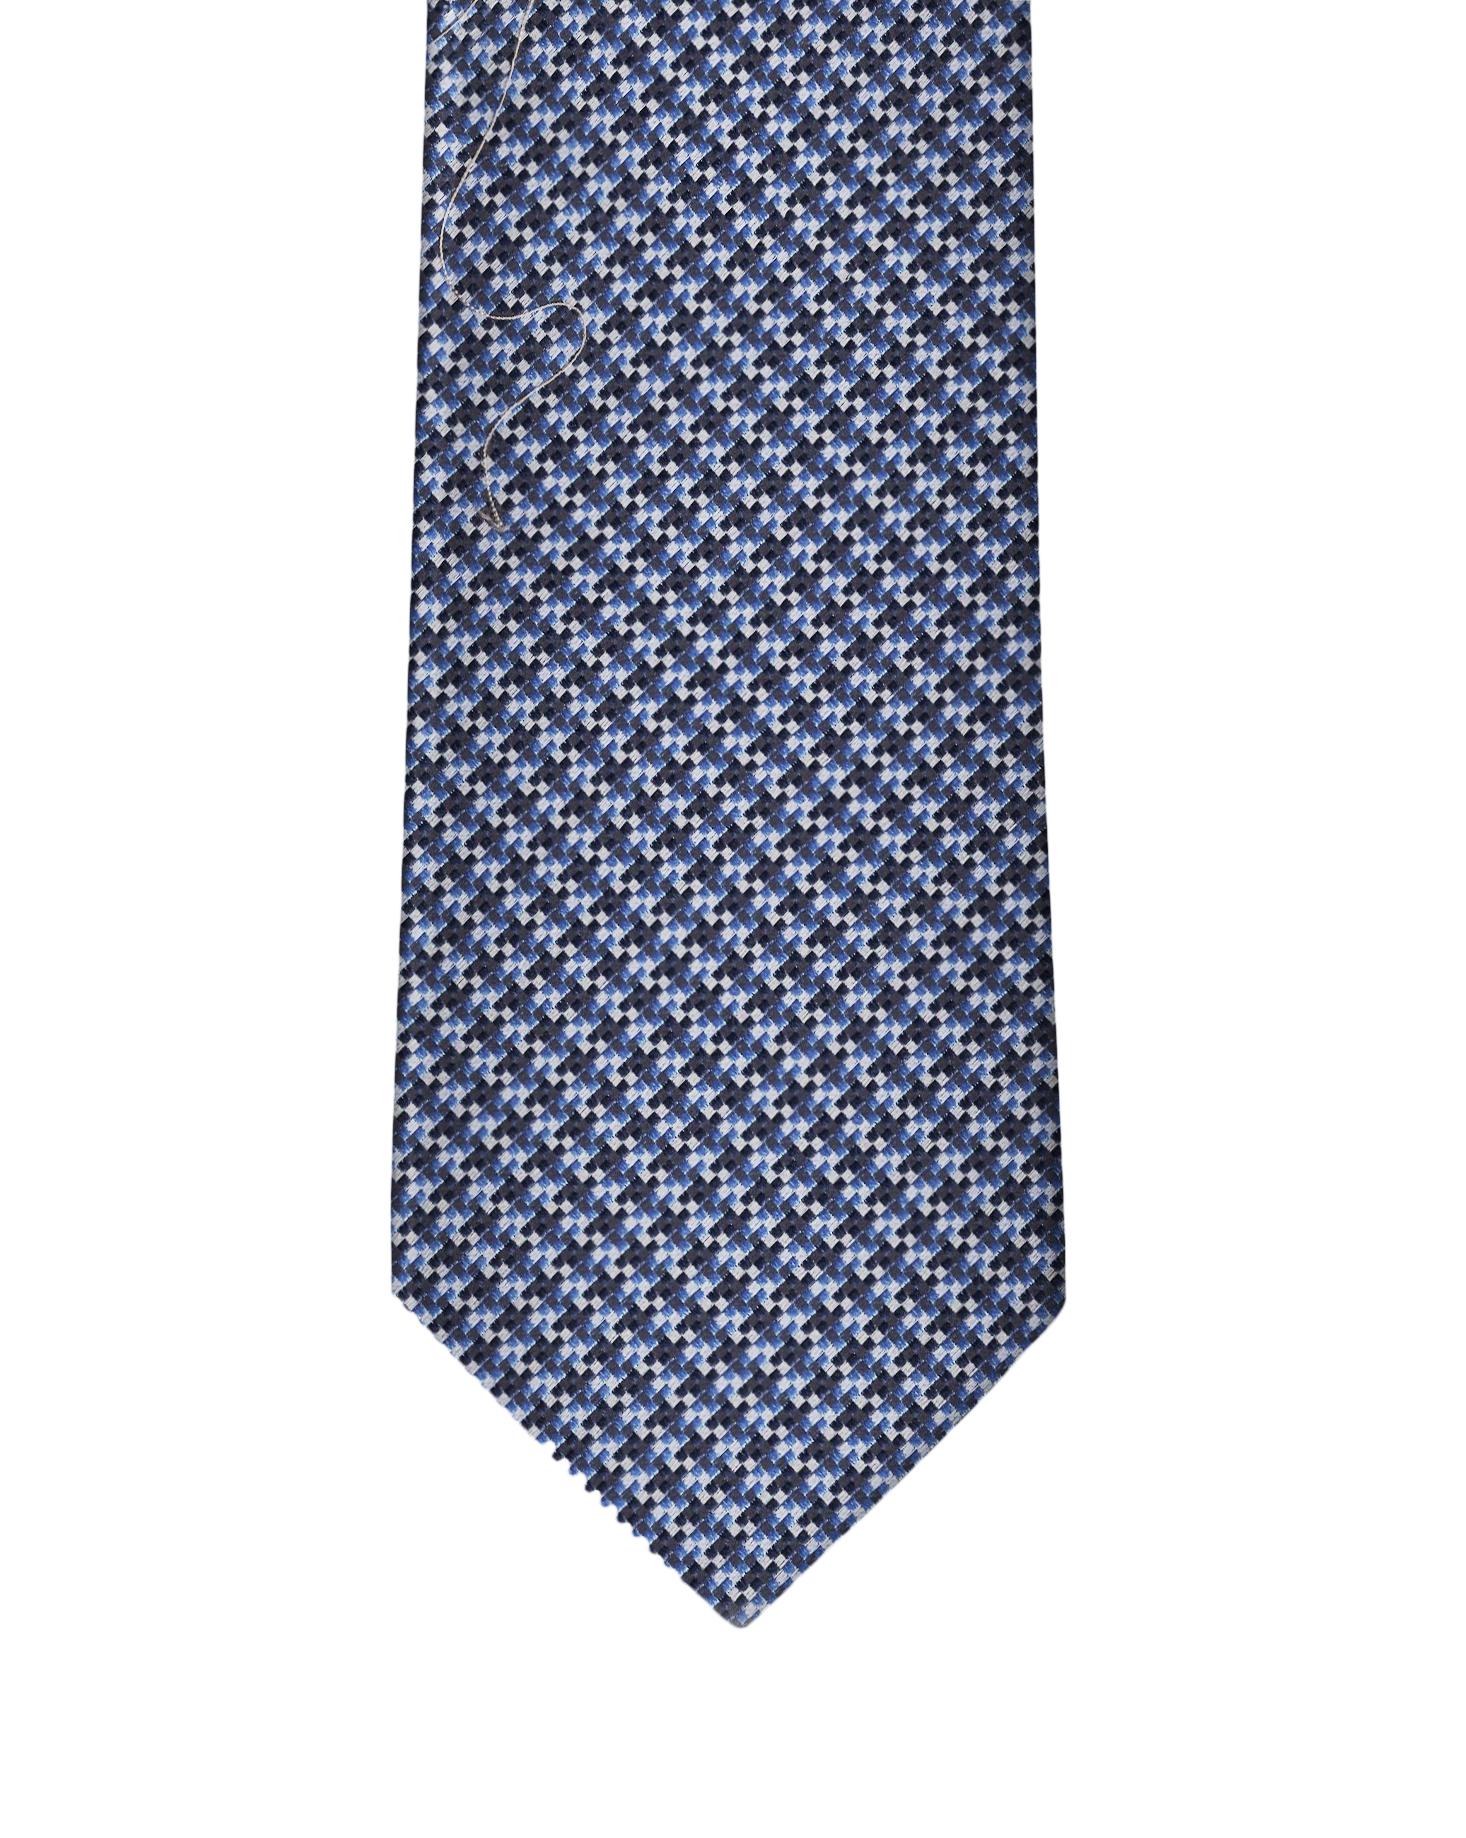 Navy & Sky Blue Micro houndstooth Necktie